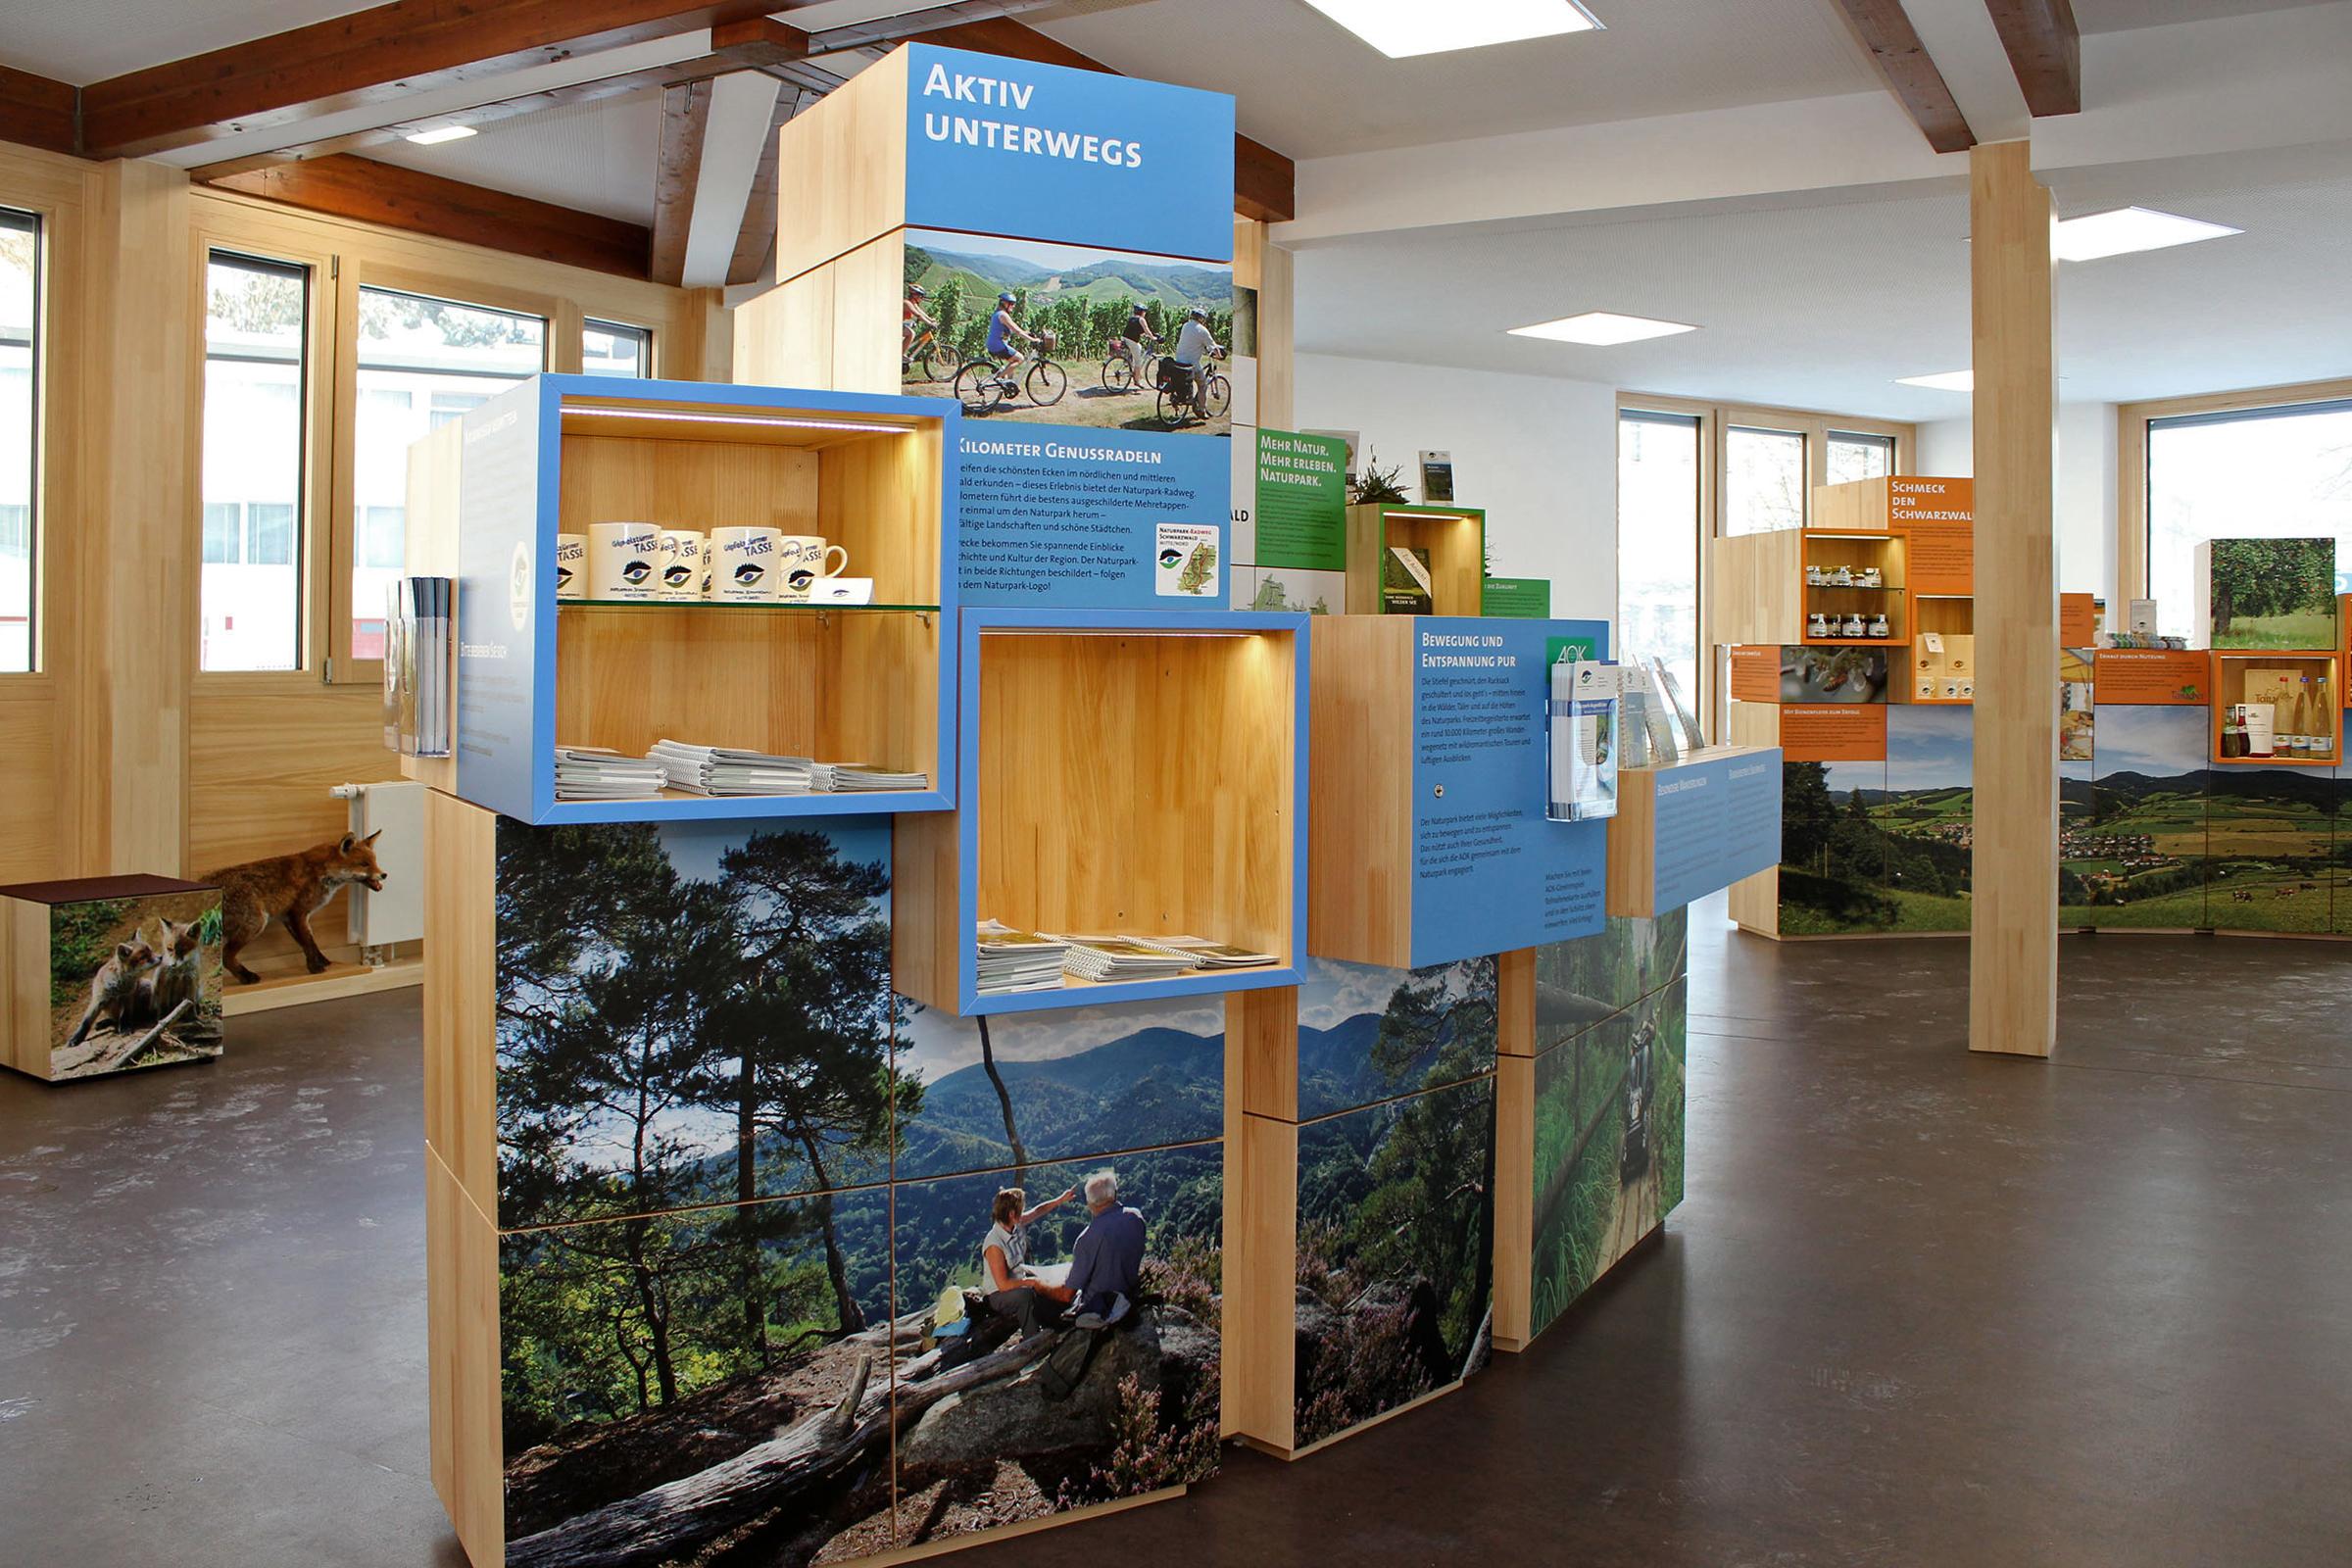 Blau: Aktiv-Erlebnis, Orange: Regionalvermarktung, Grün: Naturpark / Naturpädagogik